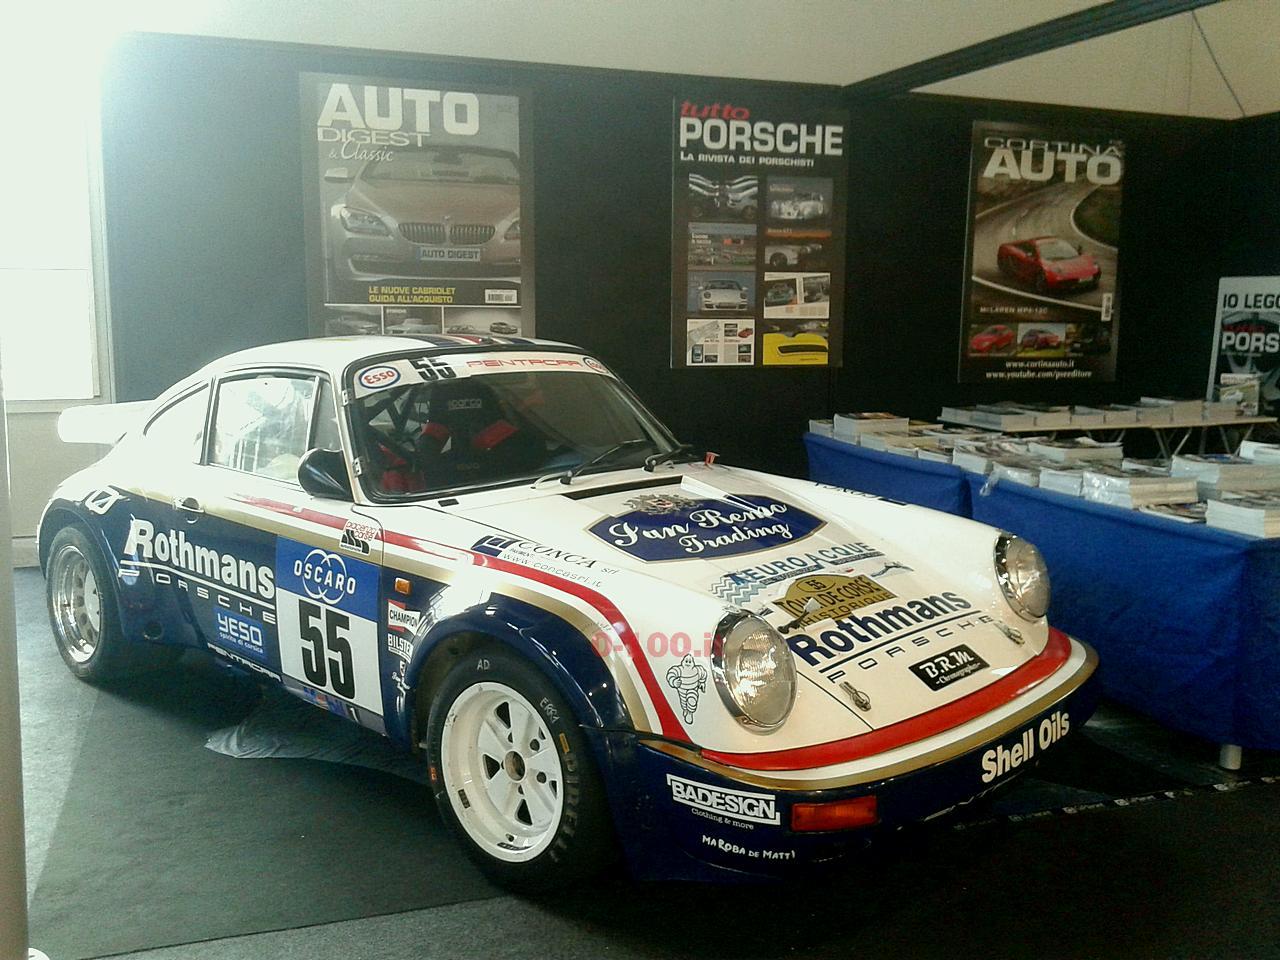 automotodepoca-2015-porsche-911-964-993-carrera-turbo_0-100_024